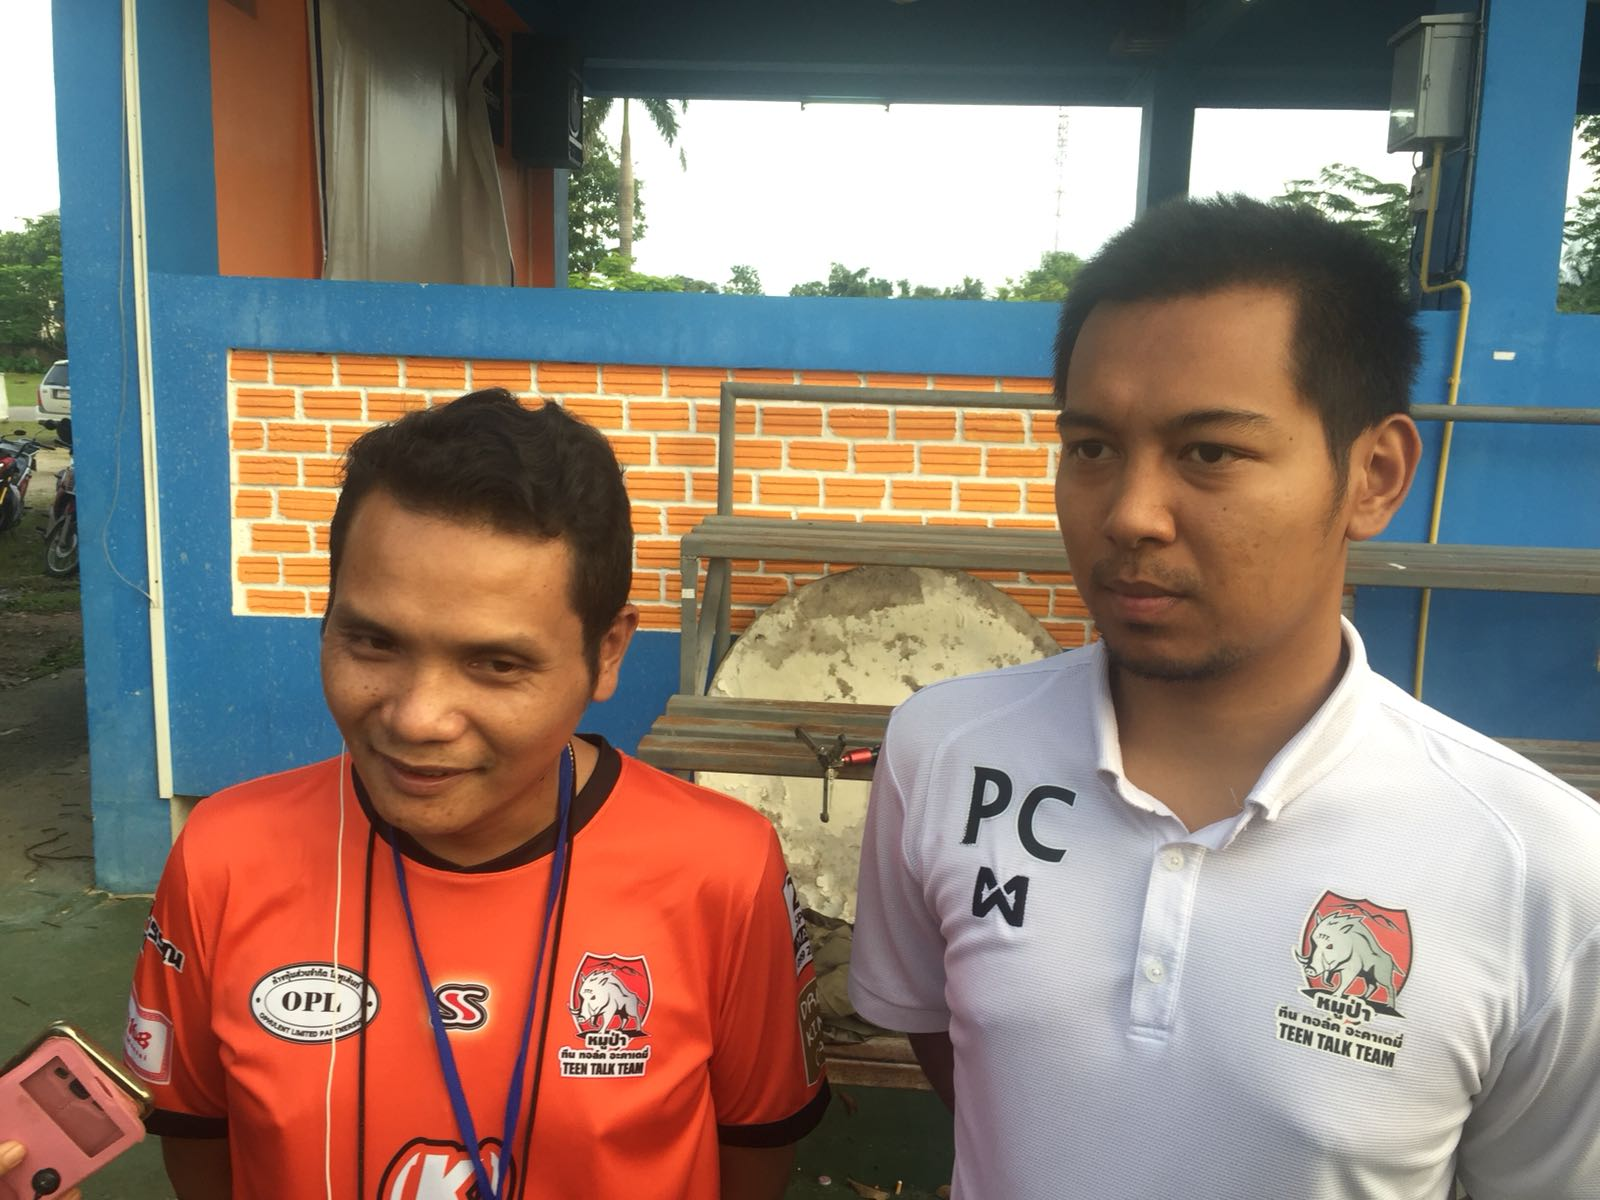 Nopparat Kanthawong, the Wild Boars head coach, left, and Pannawit Jongkham, the senior team's coach, right, speak to CNN.